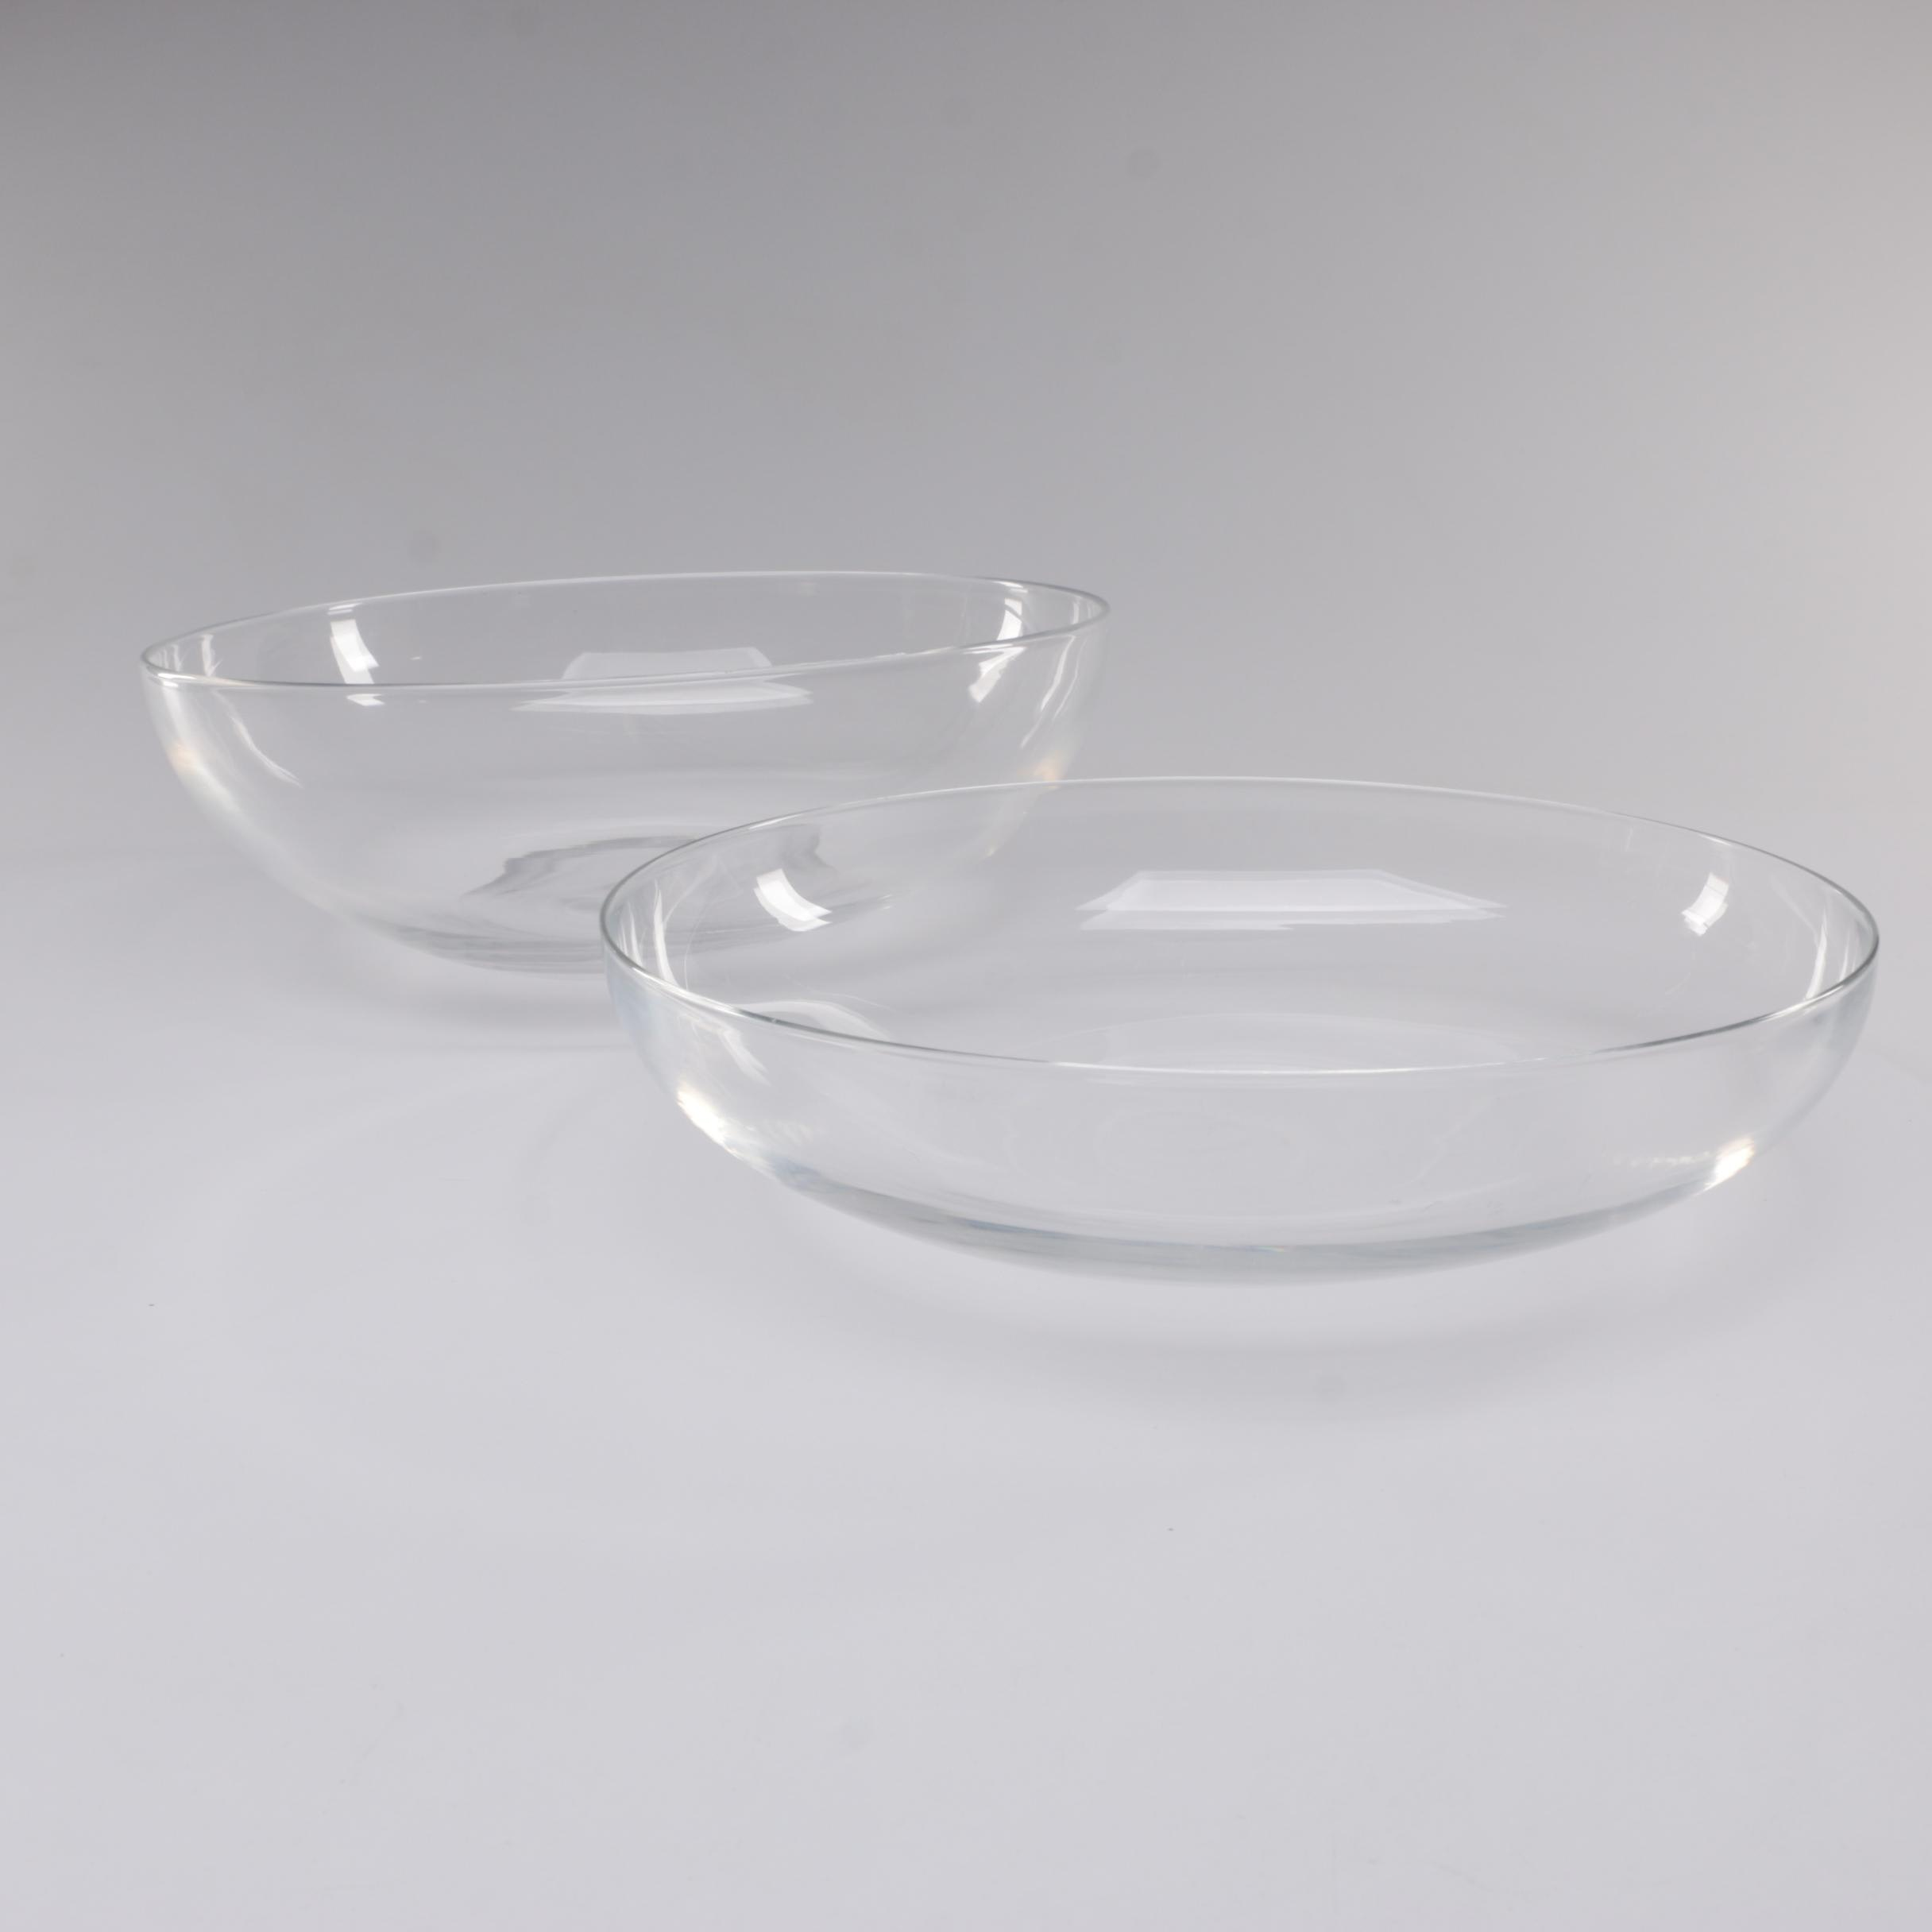 Steuben Art Glass Serving Bowls, Mid-Century